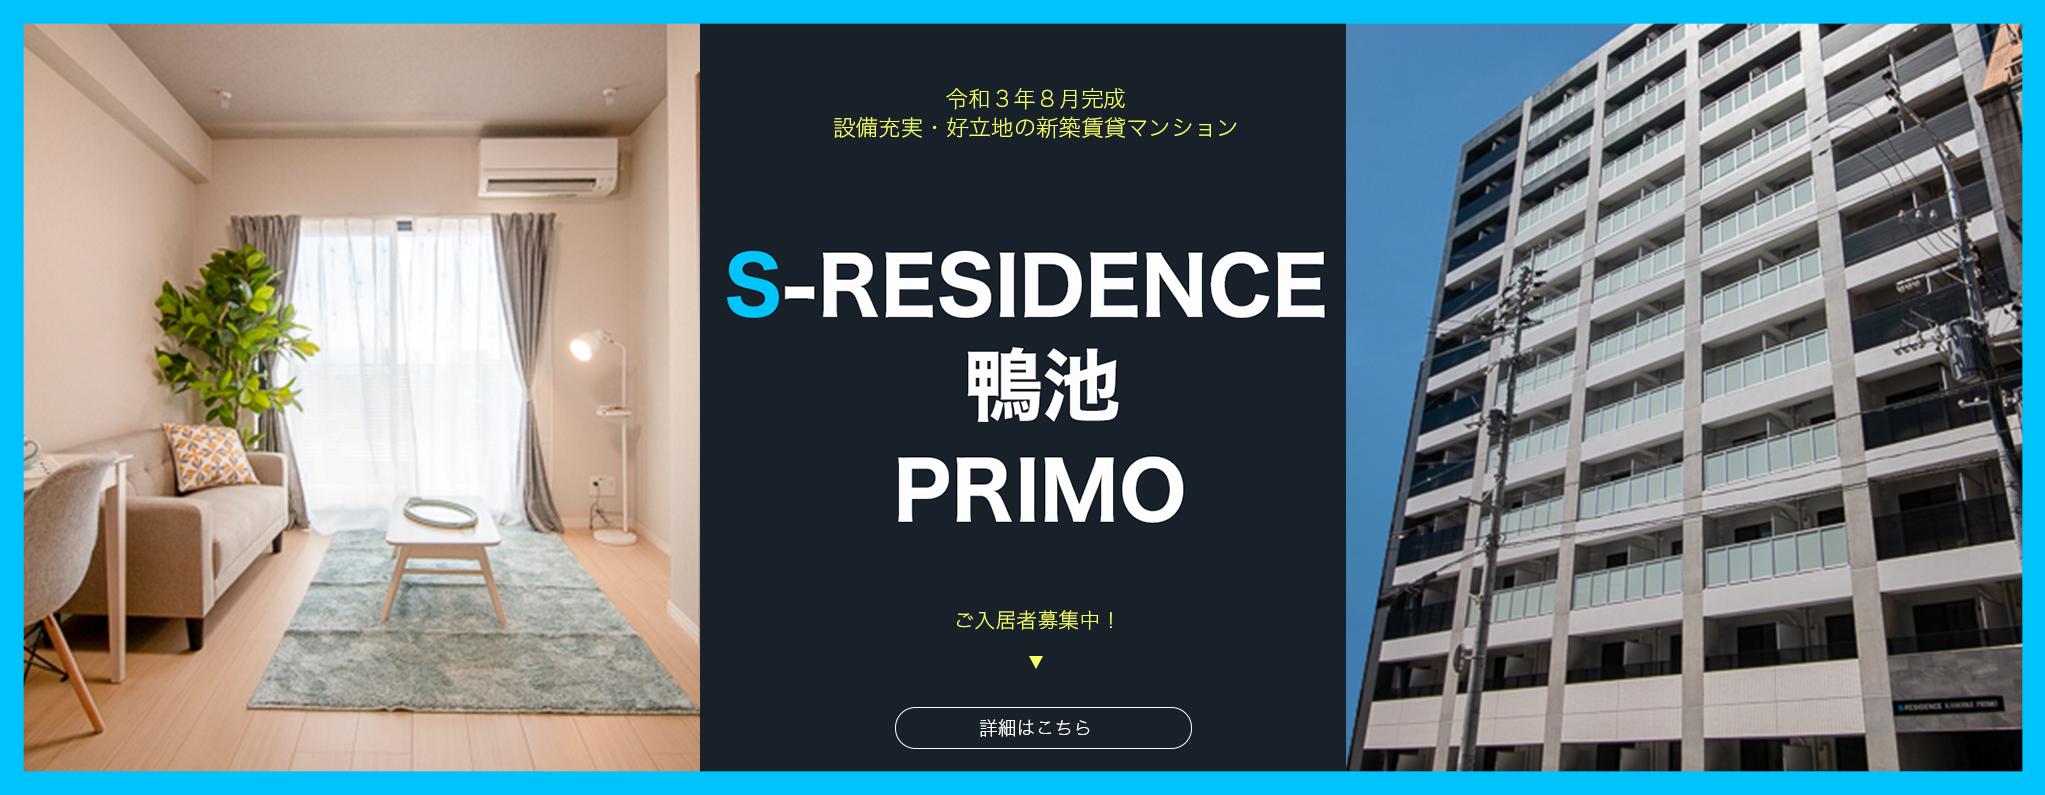 S-RESIDENCE 鴨池 PRIMO